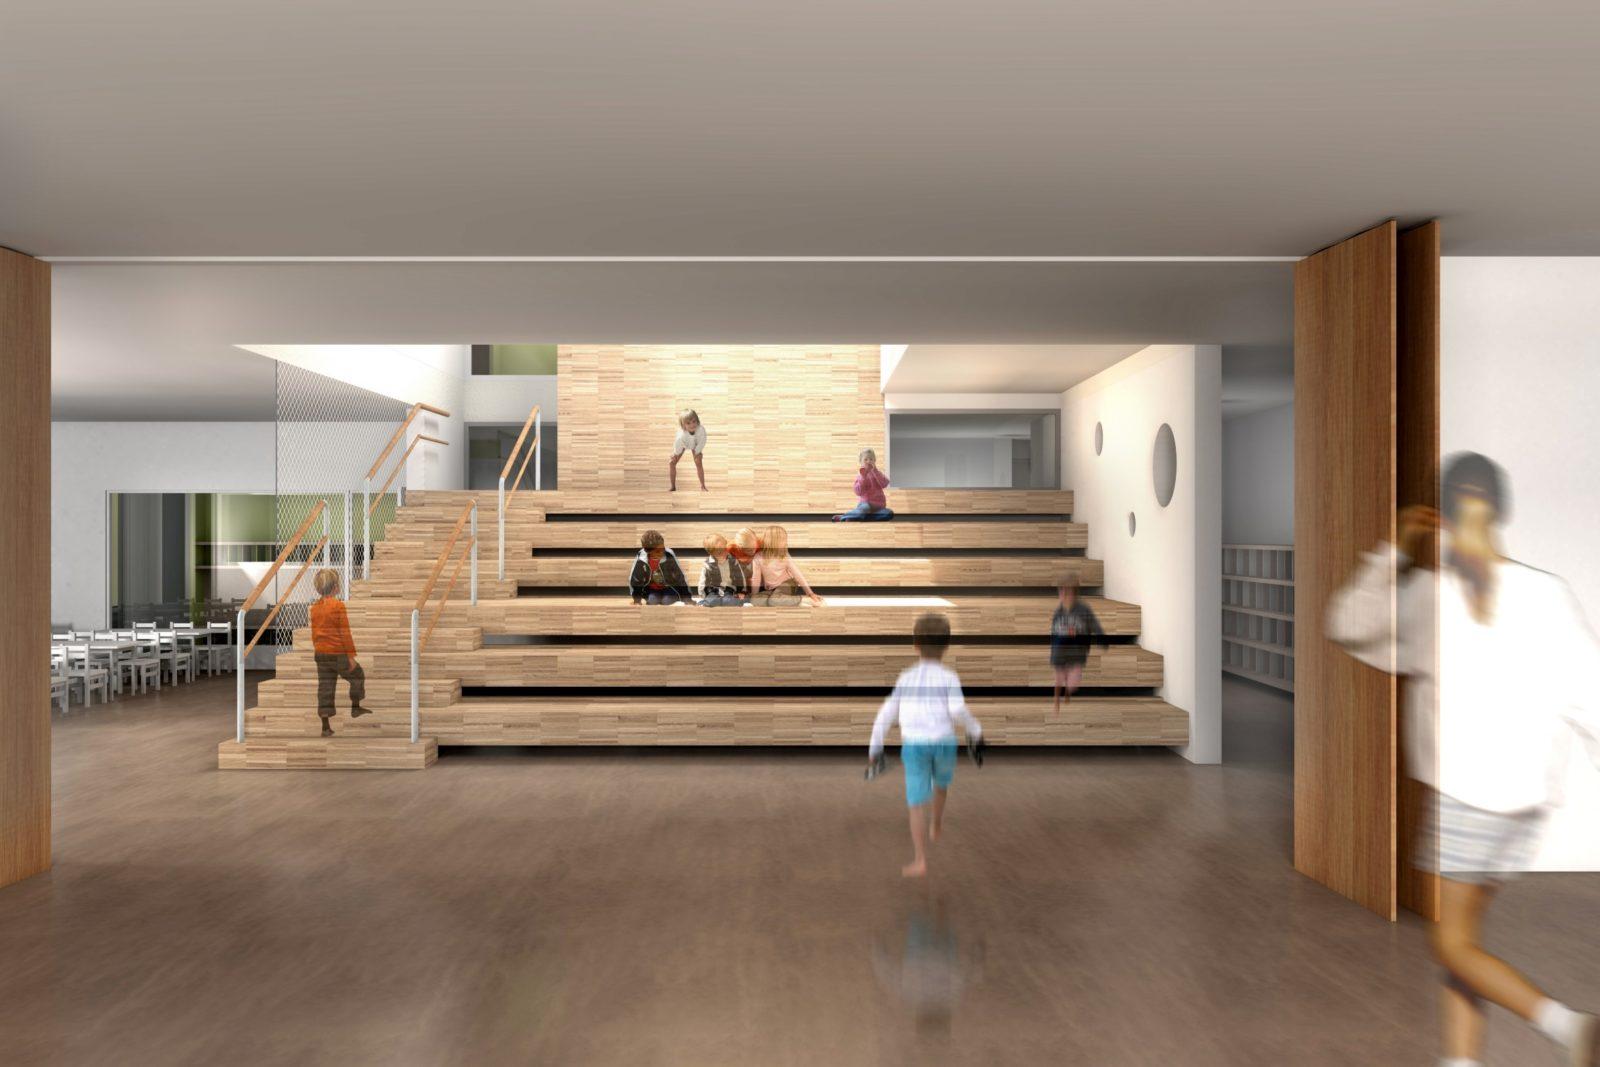 kita_Goyastrasse-Zentraltreppe-Planung